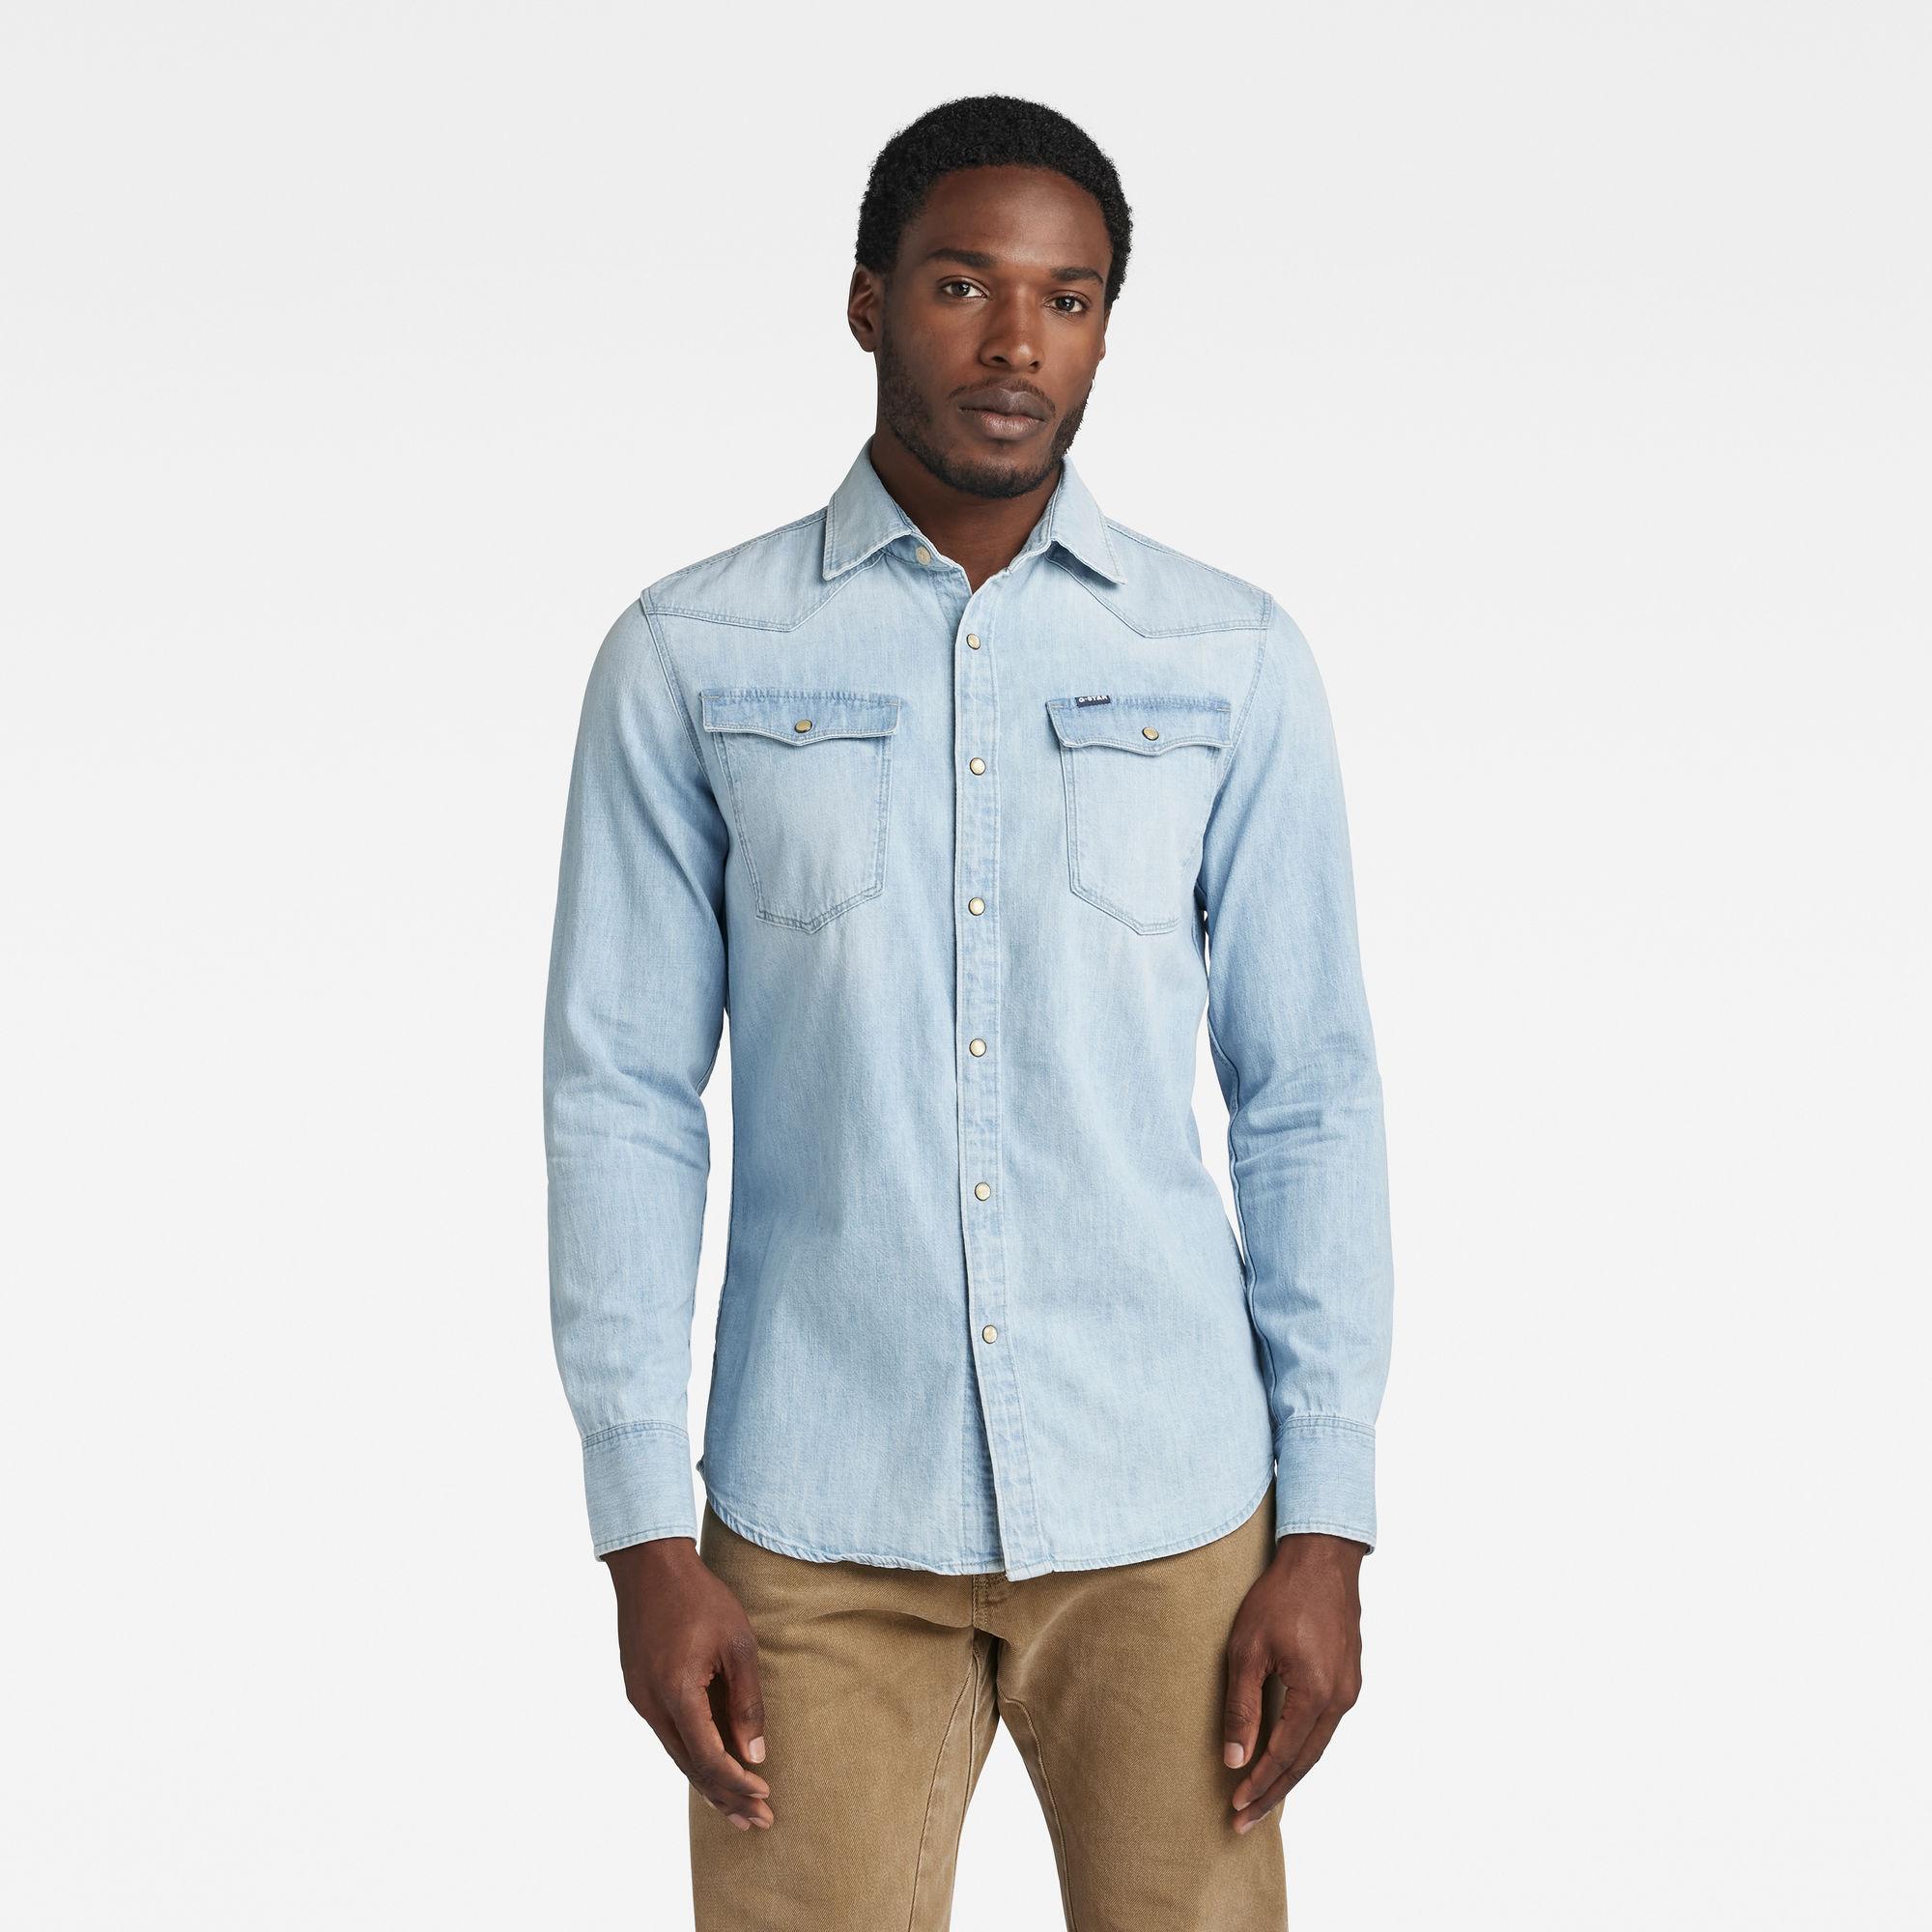 G-Star RAW Heren 3301 Slim Shirt Lichtblauw